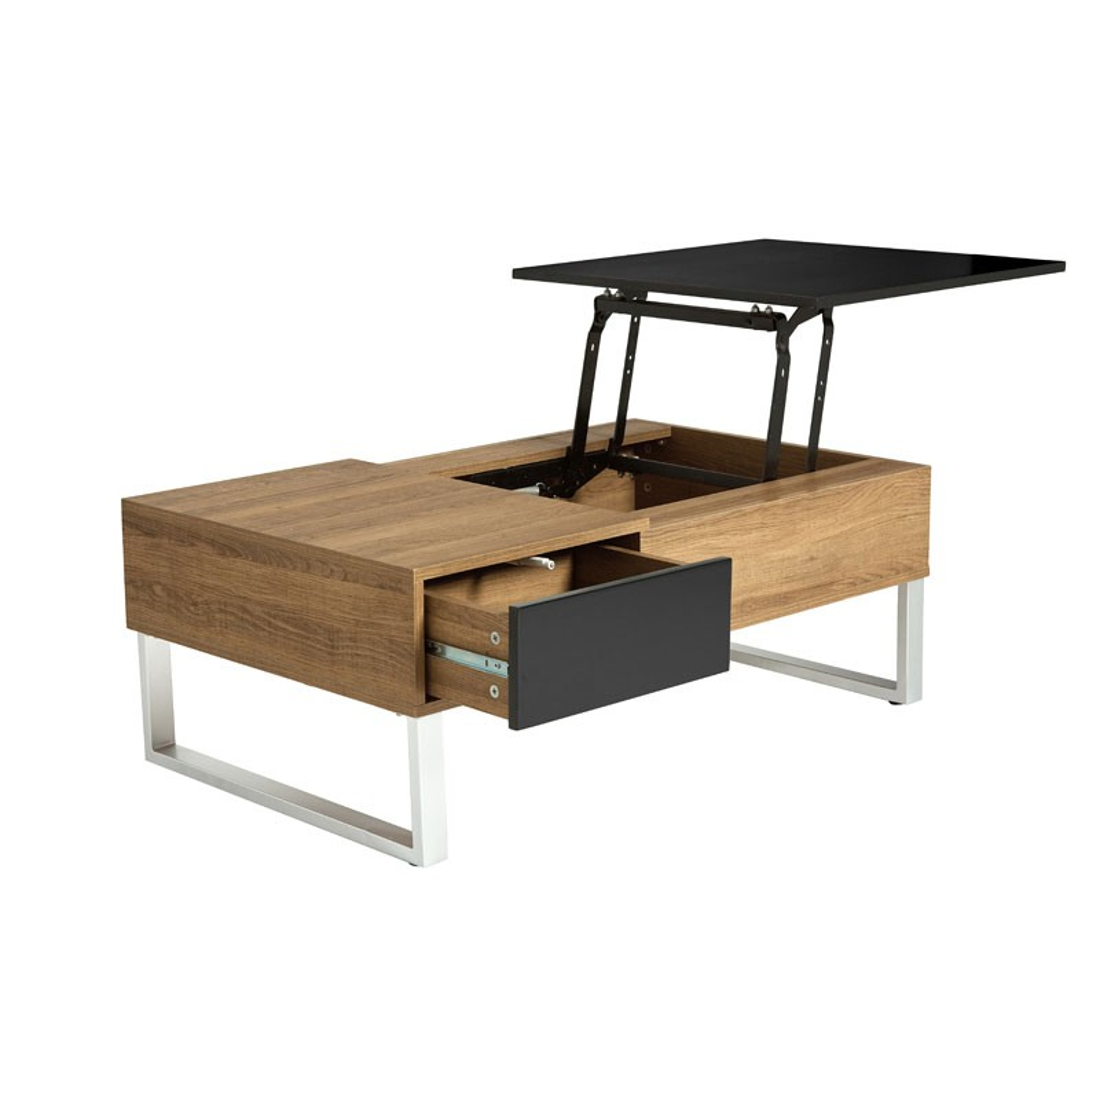 table basse relevable bois noir 2 tiroirs pierre univers. Black Bedroom Furniture Sets. Home Design Ideas